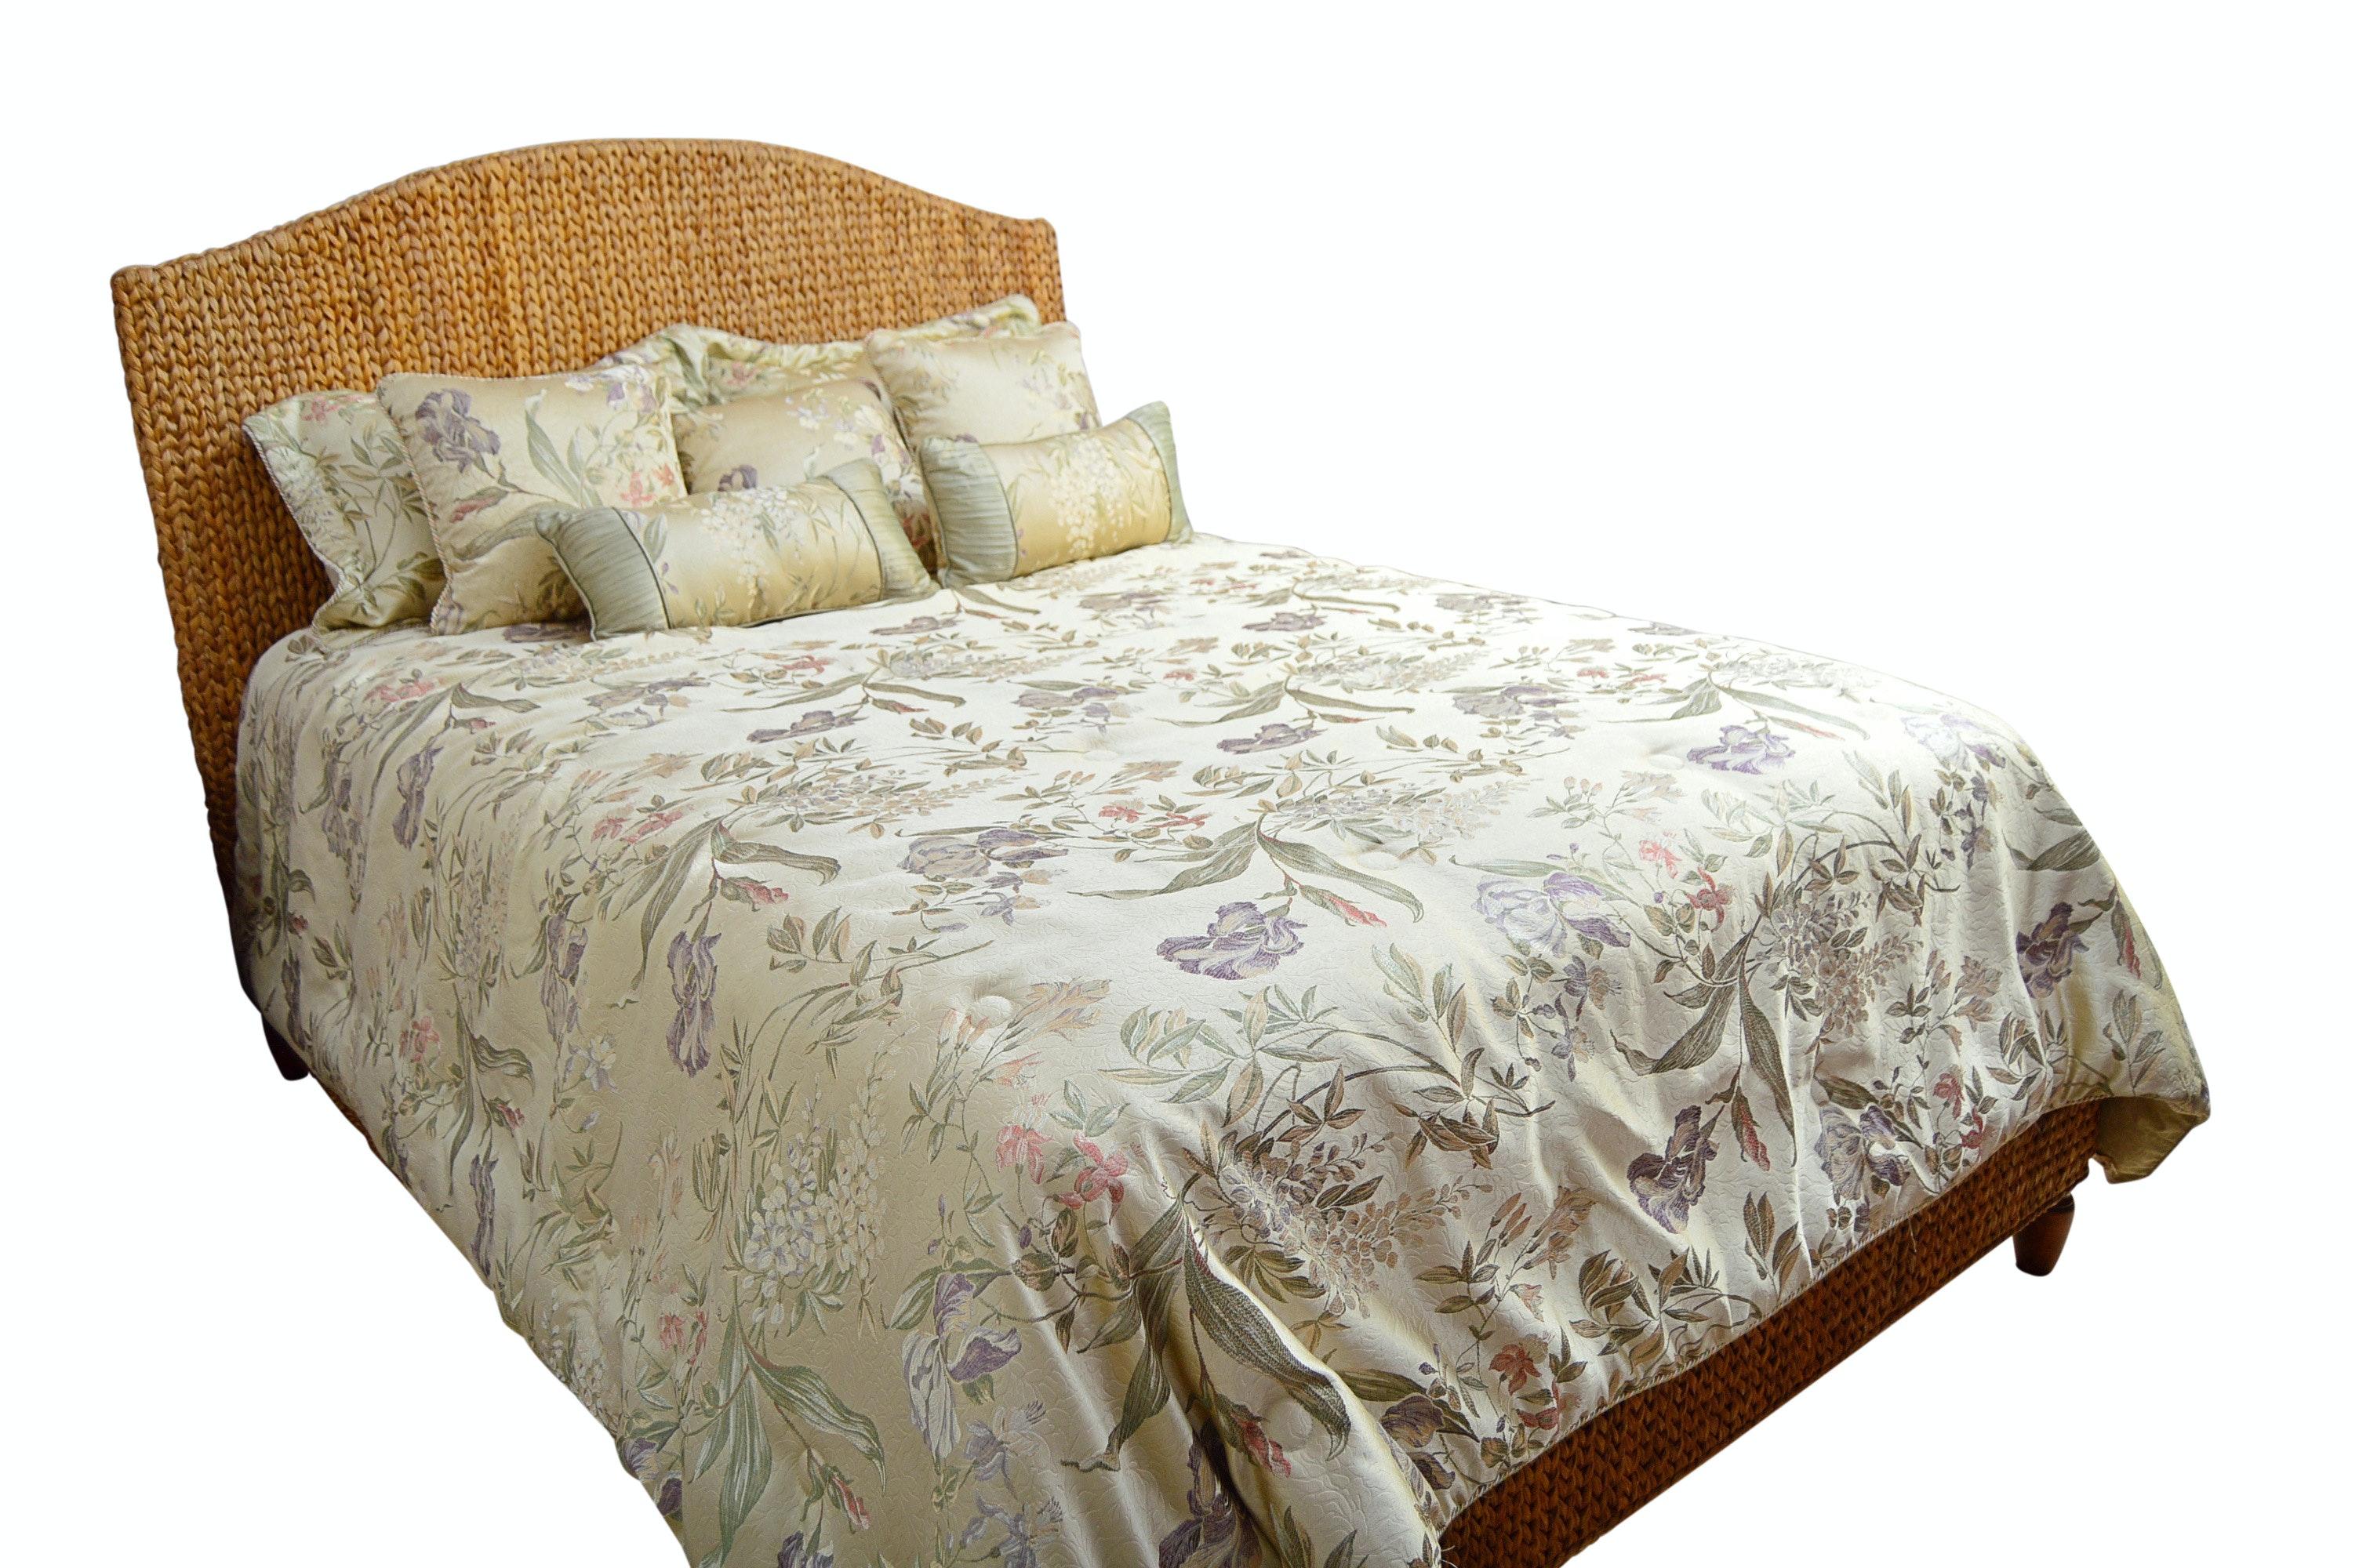 La-Z-Boy Woven Rush Queen Size Bed